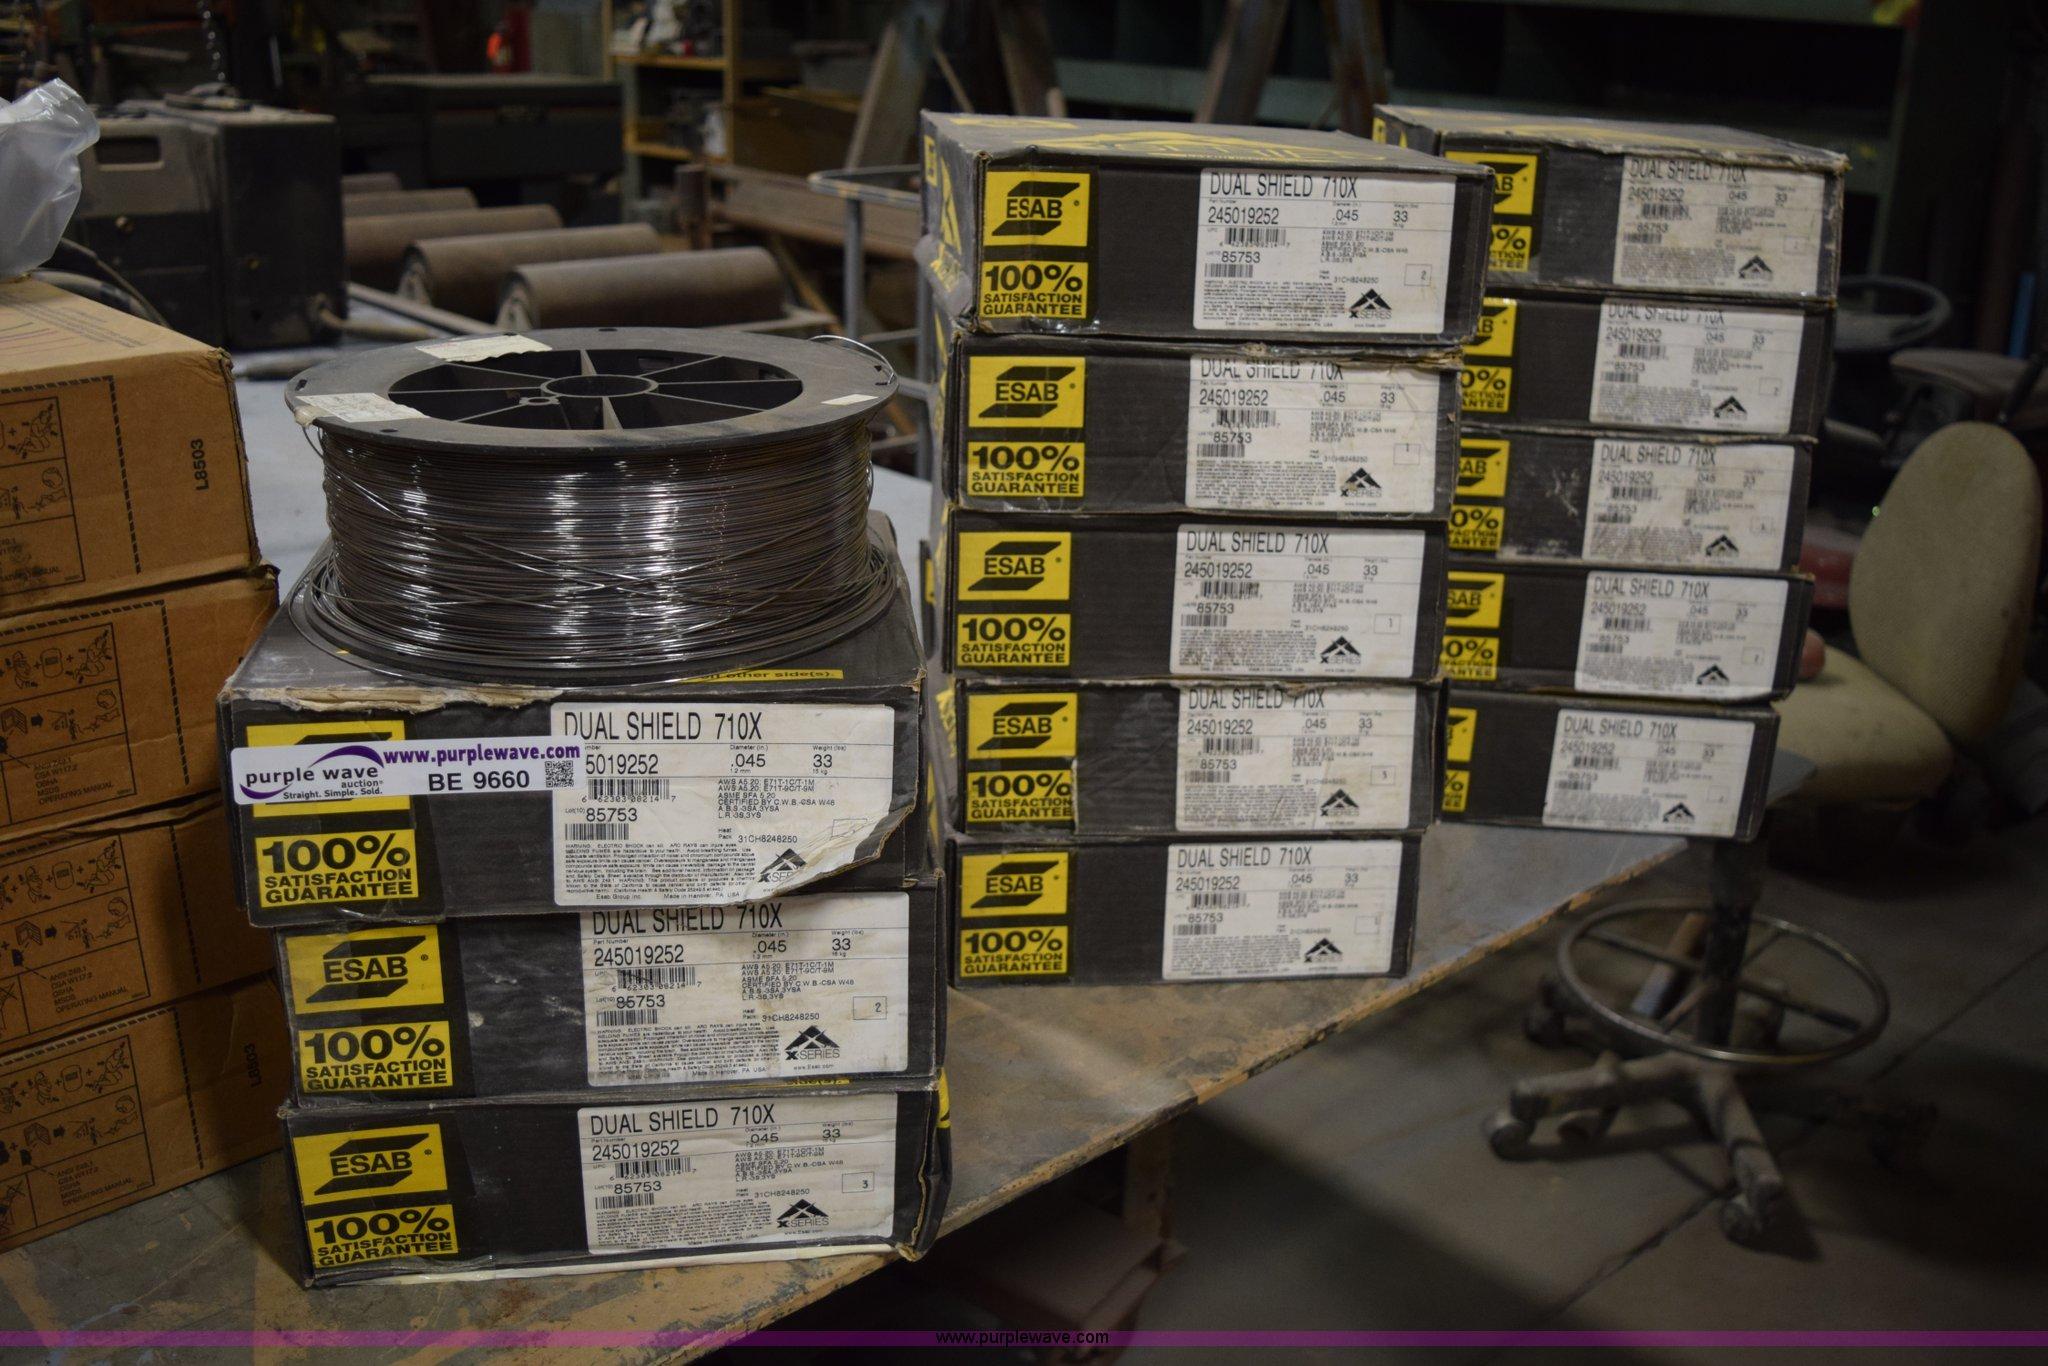 Dual Shield Welding Wire | 14 Esab Dual Shield 710x Welding Wire Spools Item Be9660